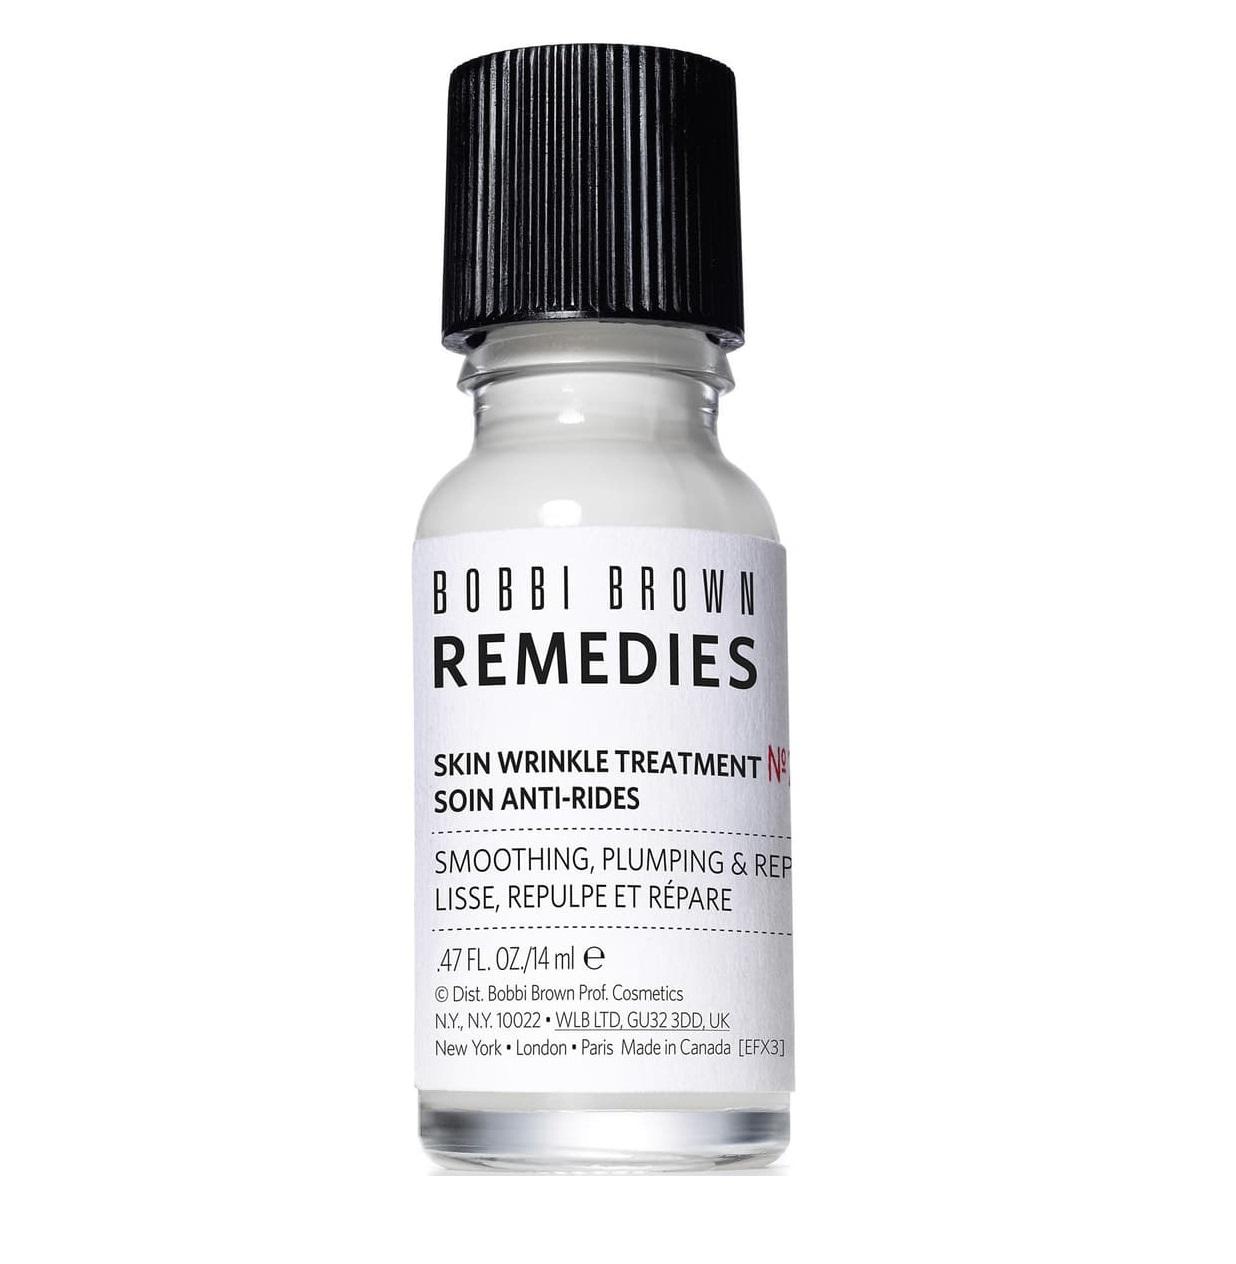 tinh-chat-duong-da-bobbi-brown-remedies-skin-wrinkle-treatment-review-thanh-phan-gia-cong-dung-62